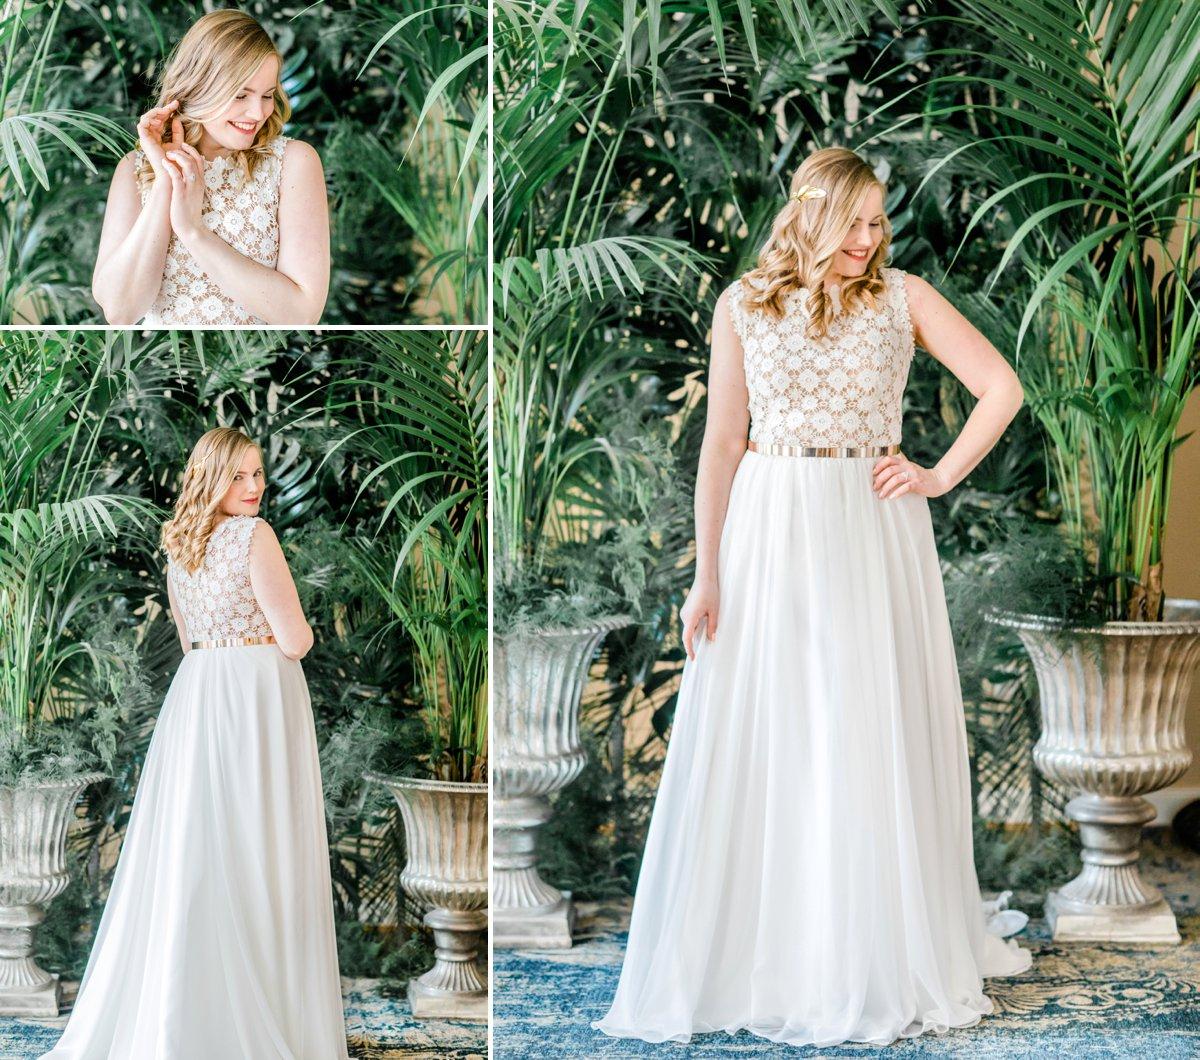 Marrymag Curvy Brides Brautkleider Fur Kurvige Braute